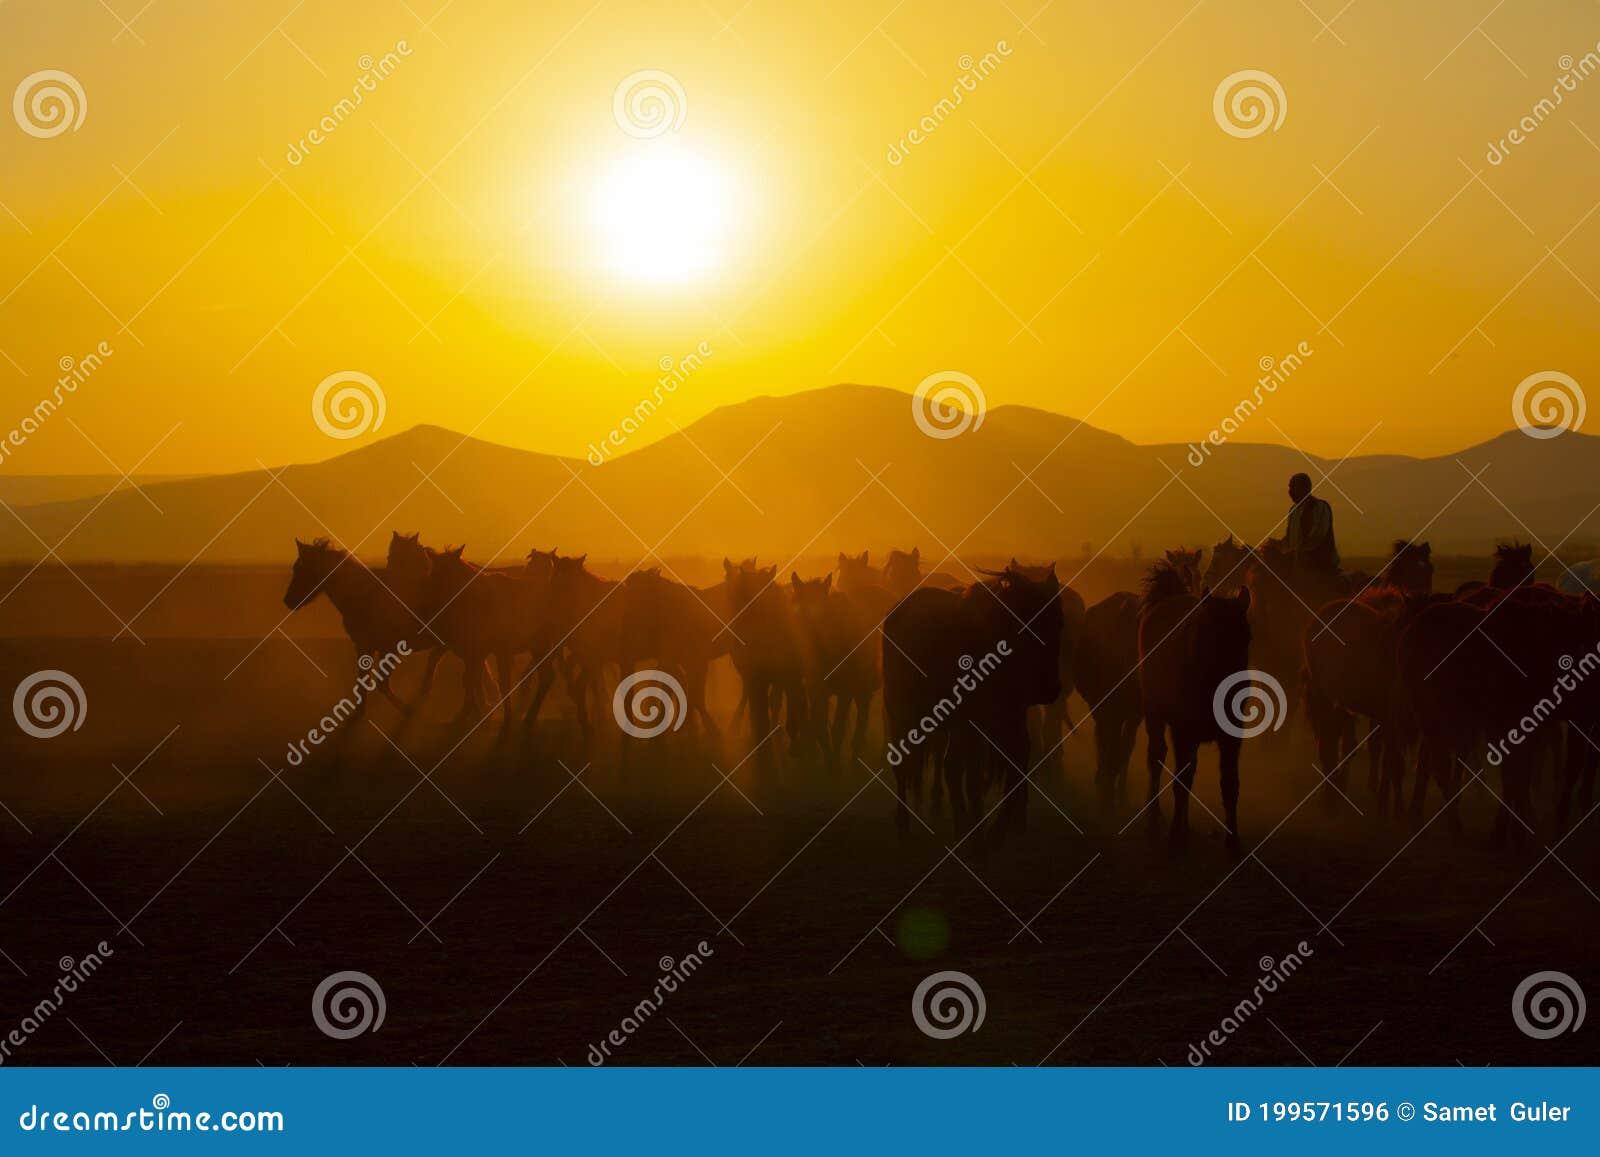 Wild Horses Running At Sunset Kayseri Turkey Editorial Photo Image Of Forward Galloping 199571596